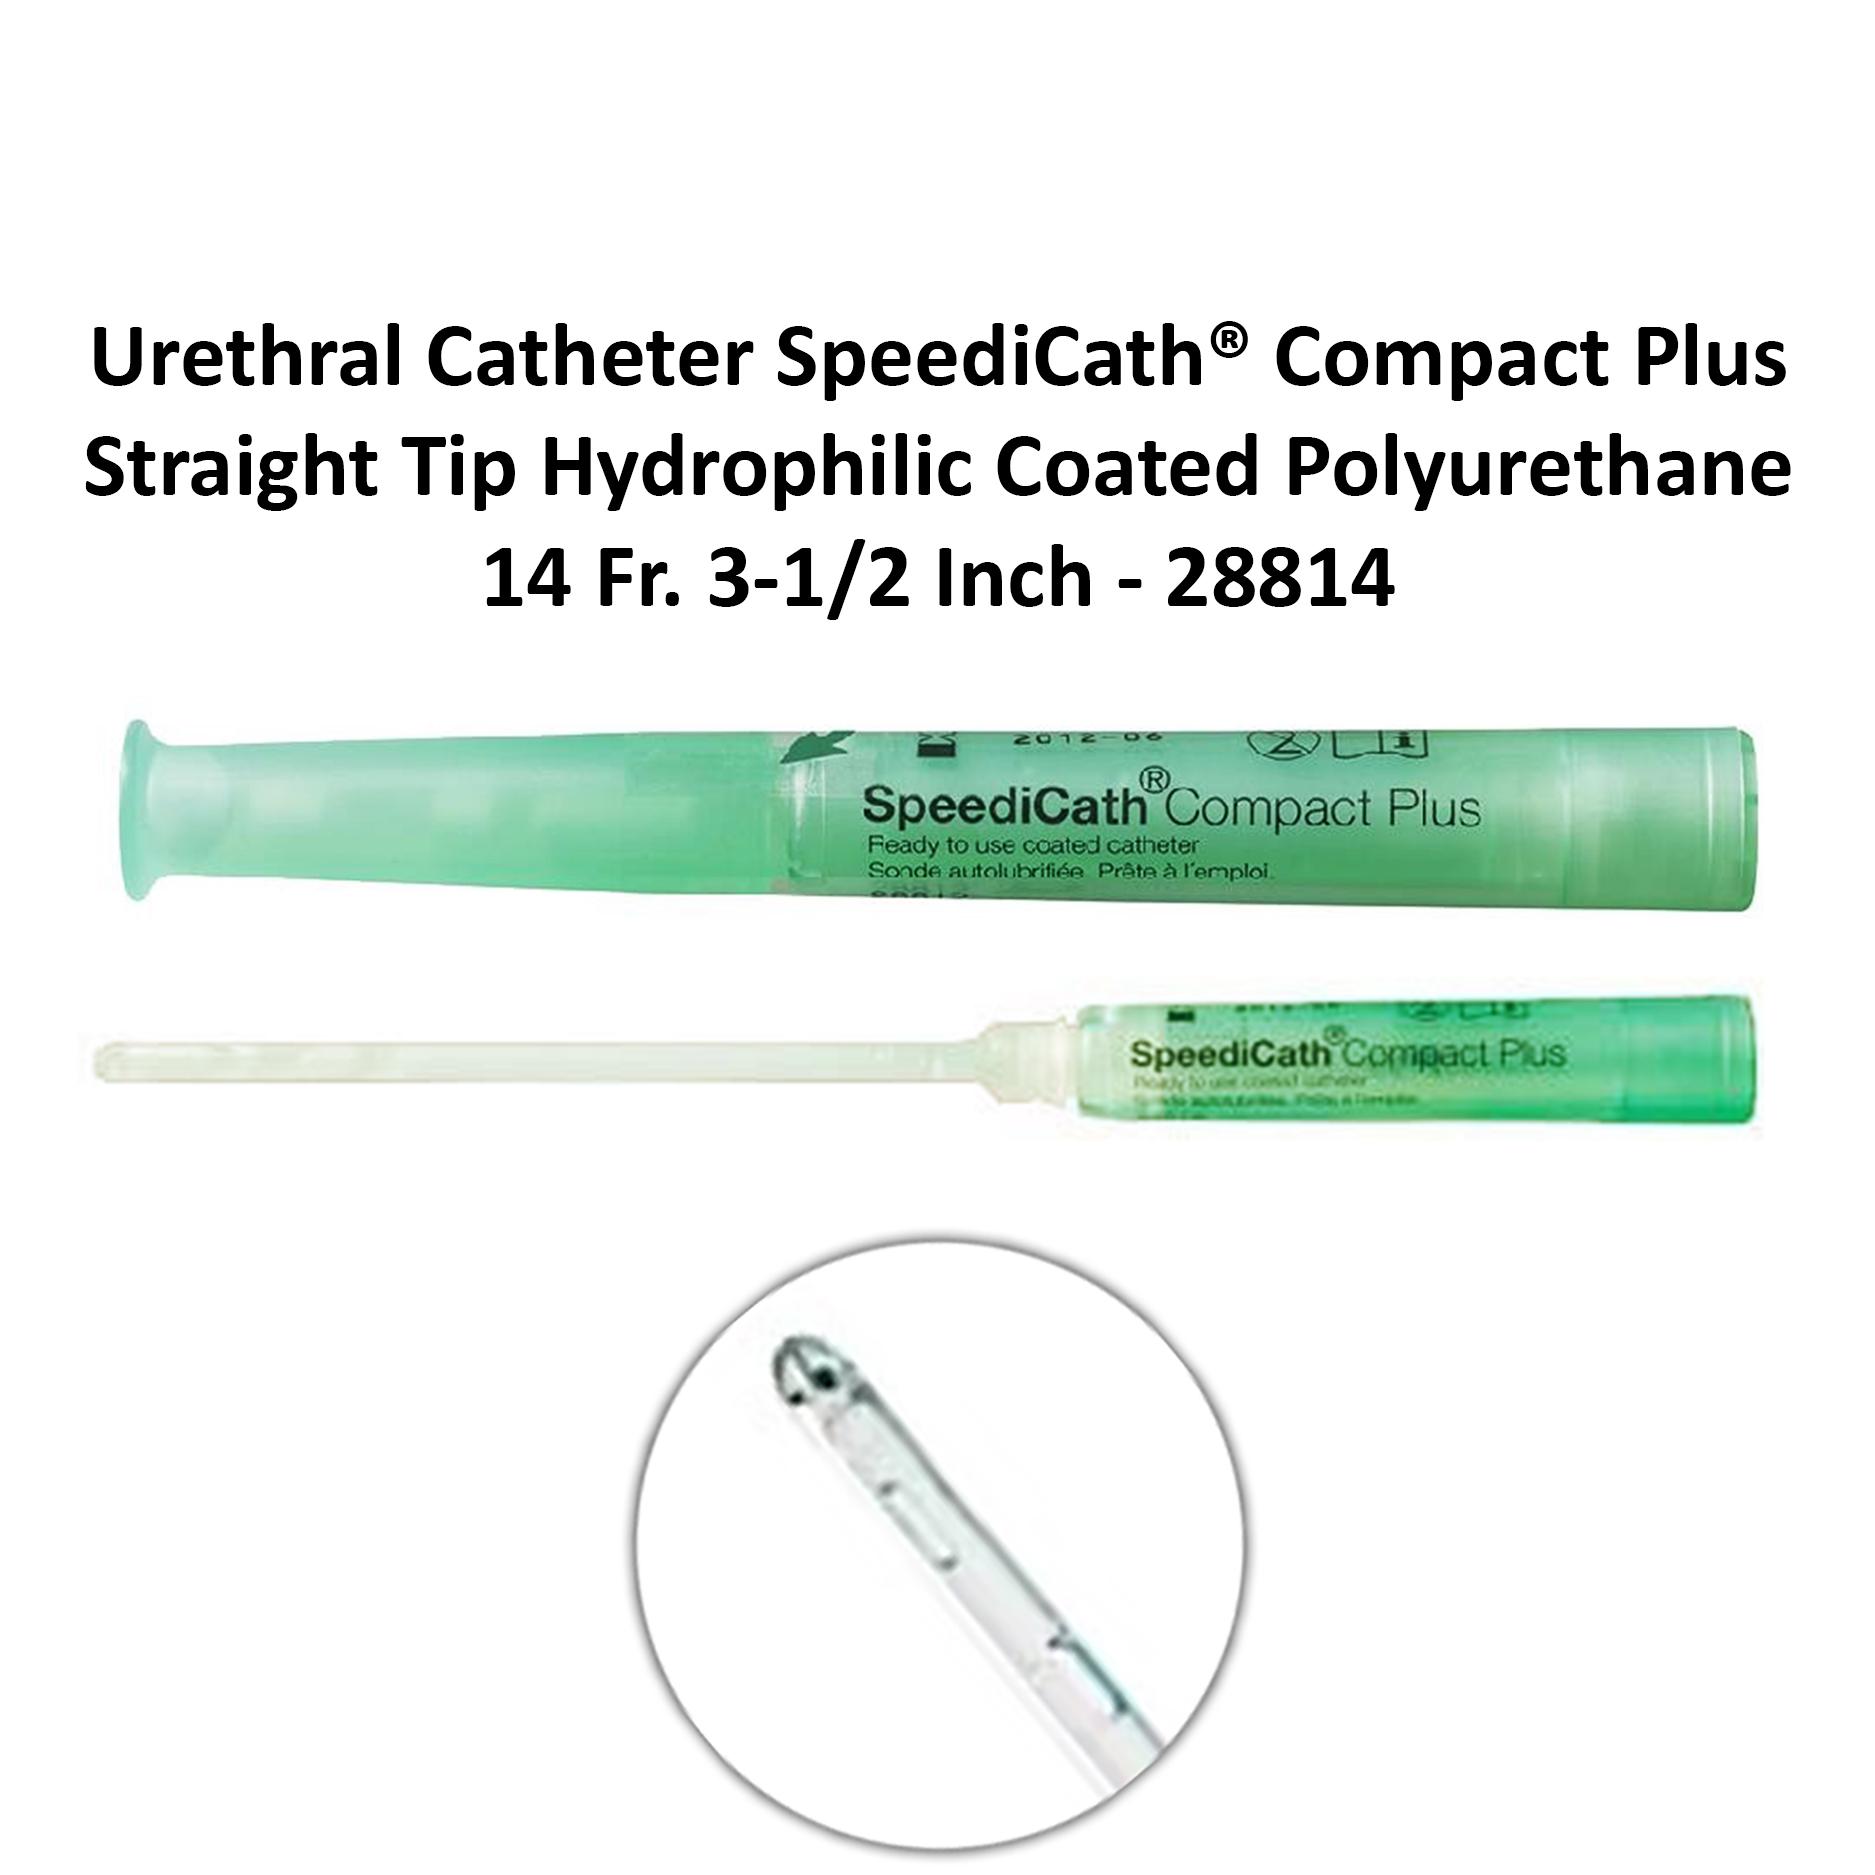 Urethral Catheter SpeediCath® Compact Plus Straight Tip Hydrophilic Coated Polyurethane 14 Fr. 3-1/2 Inch - 28814 Michigan | USA